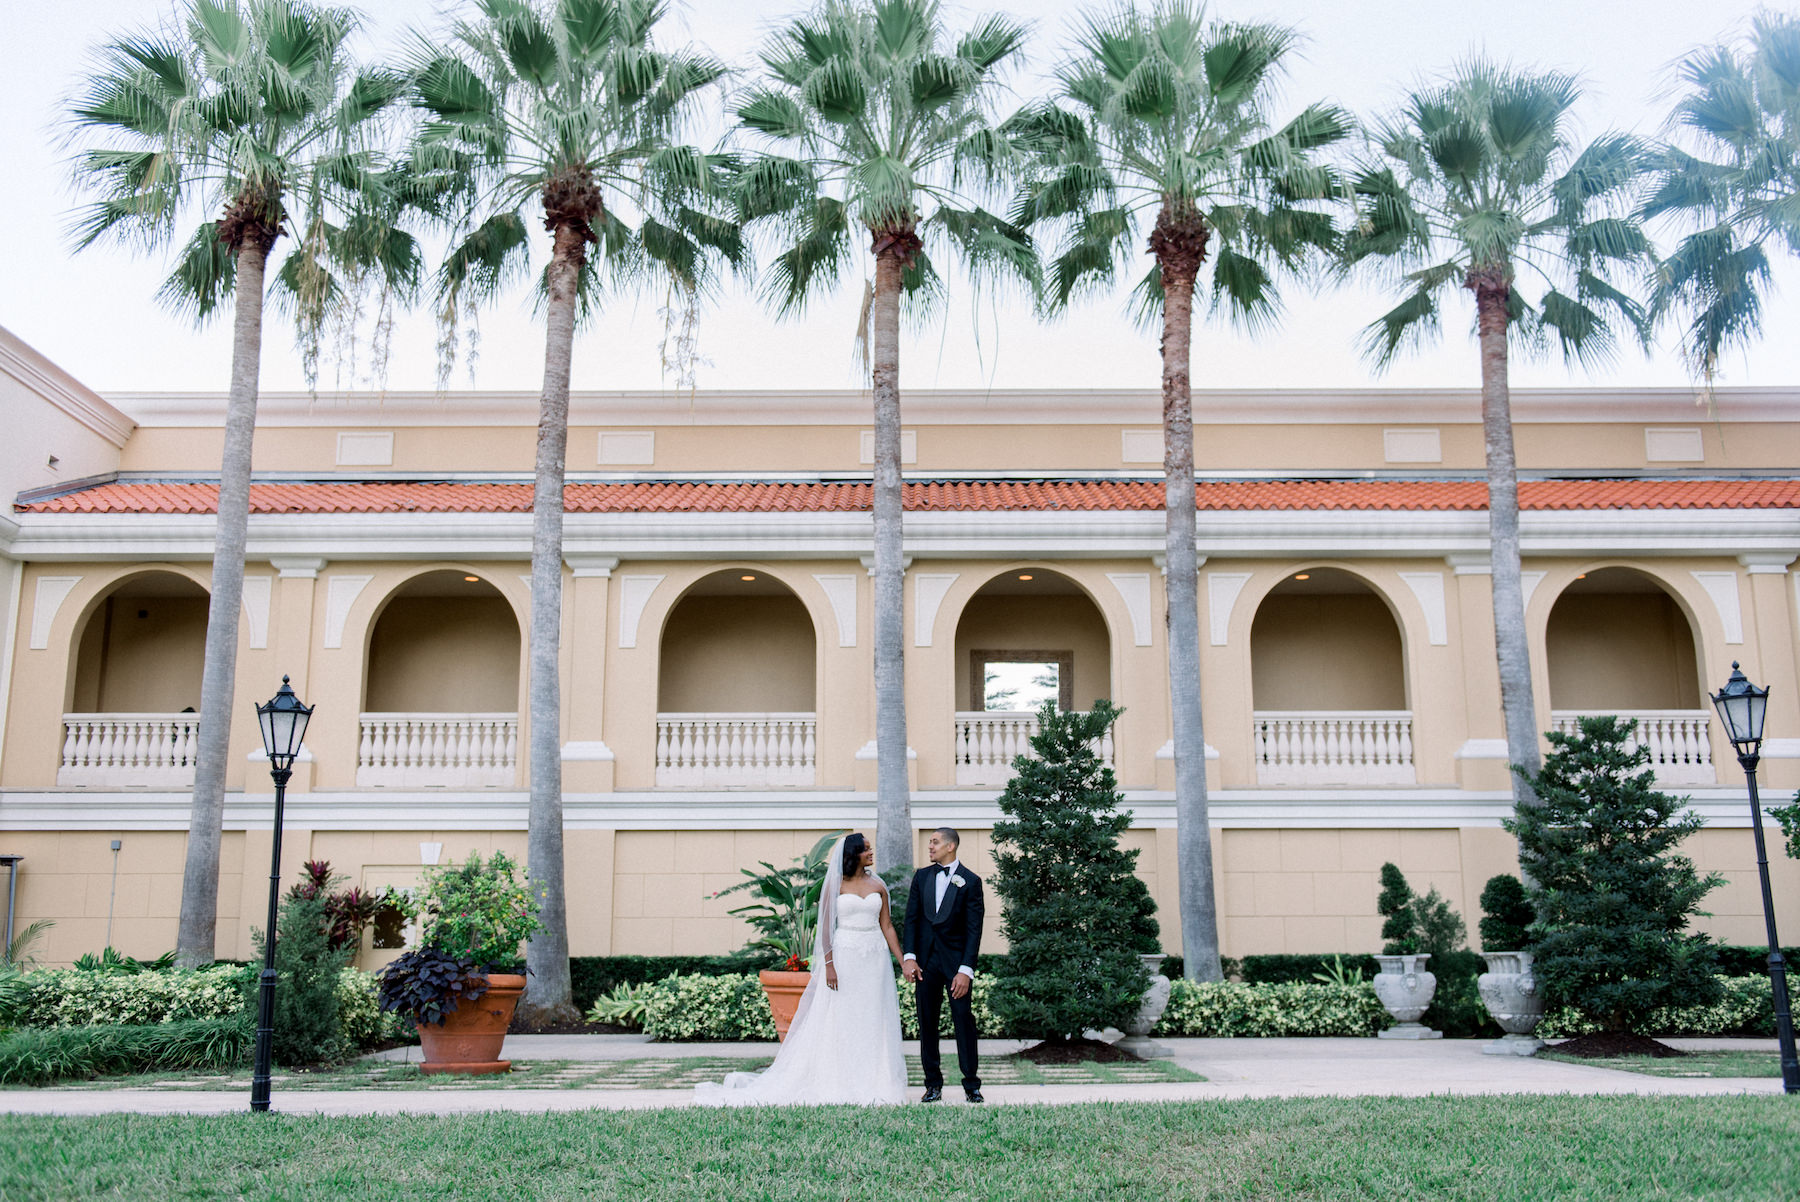 Classic Bride and Groom Wedding Portrait Outside Hotel Wedding Venue Ritz Carlton Sarasota